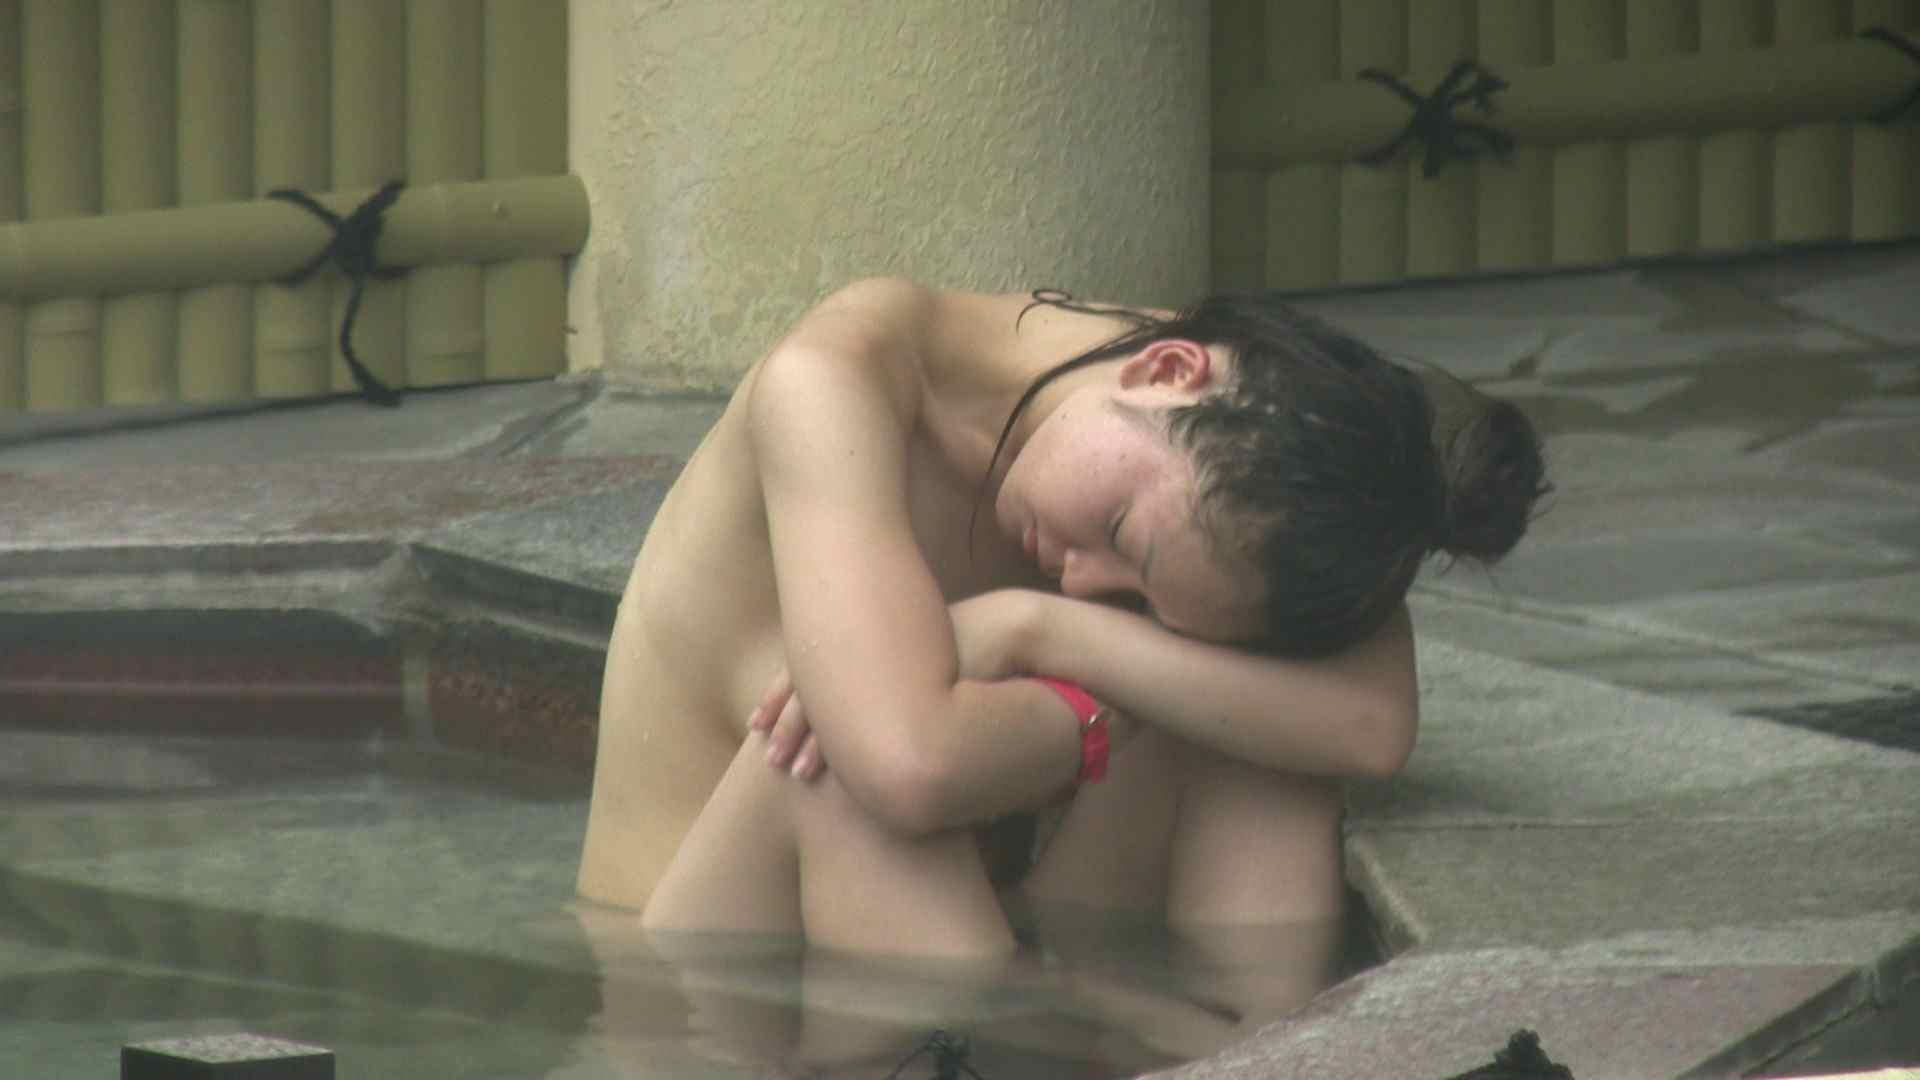 Aquaな露天風呂Vol.137 エッチな盗撮 オメコ無修正動画無料 92pic 15